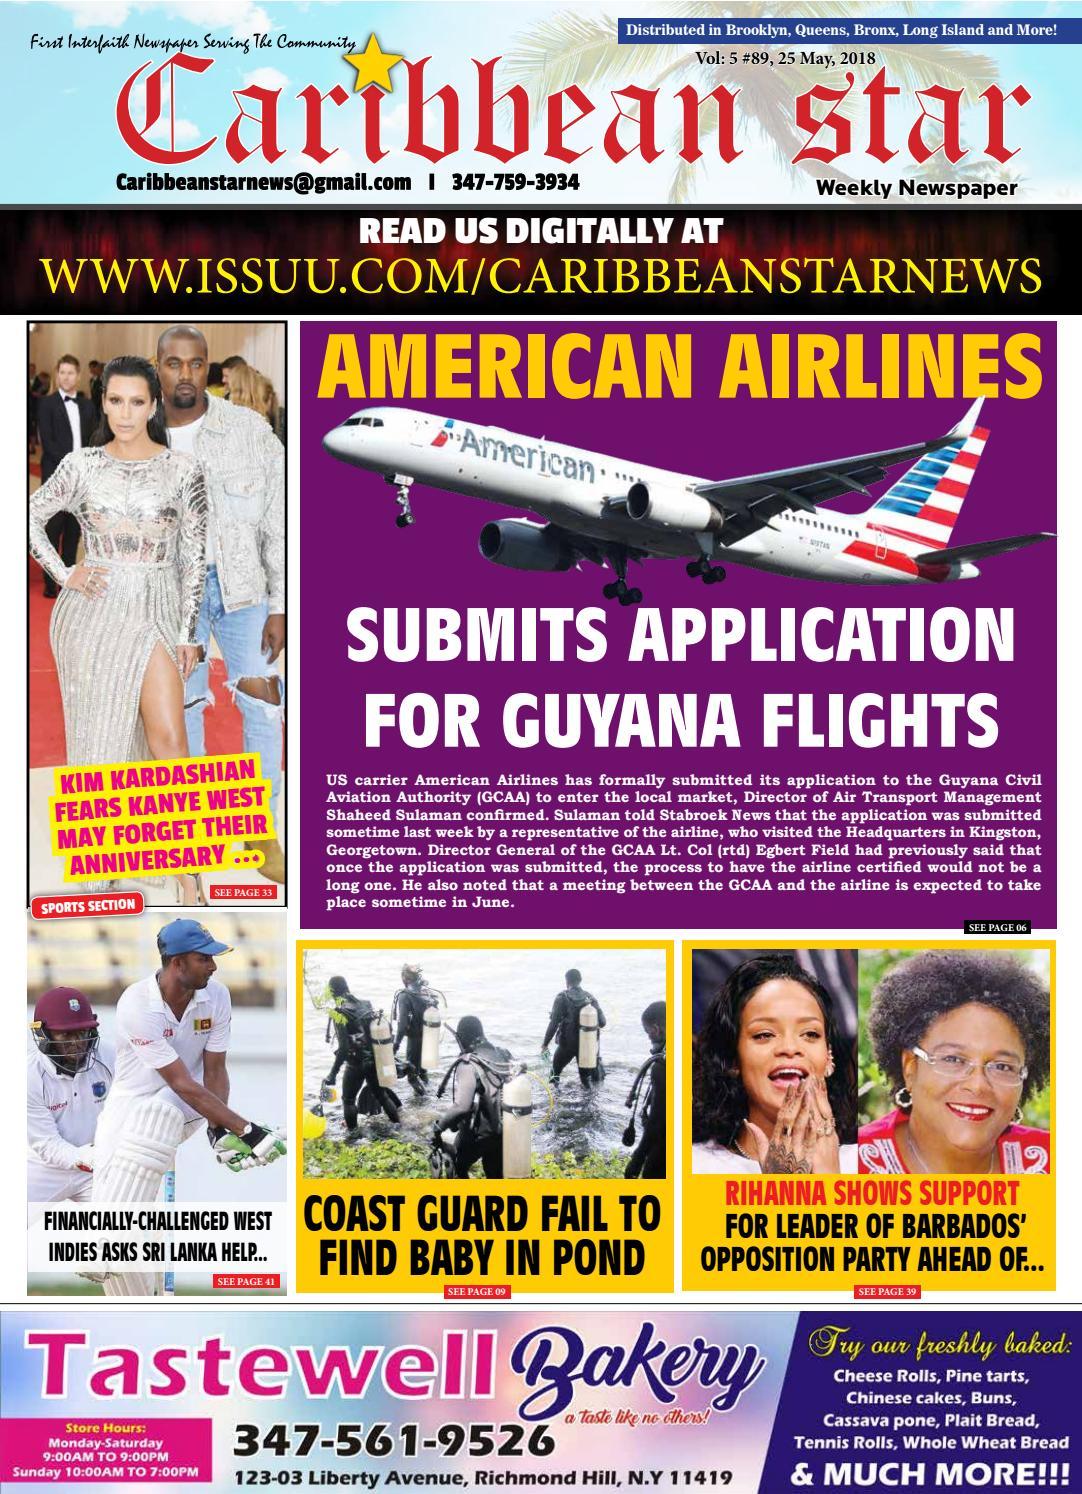 Caribbean star 25 may 2018 epaper by Caribbean Star News - issuu